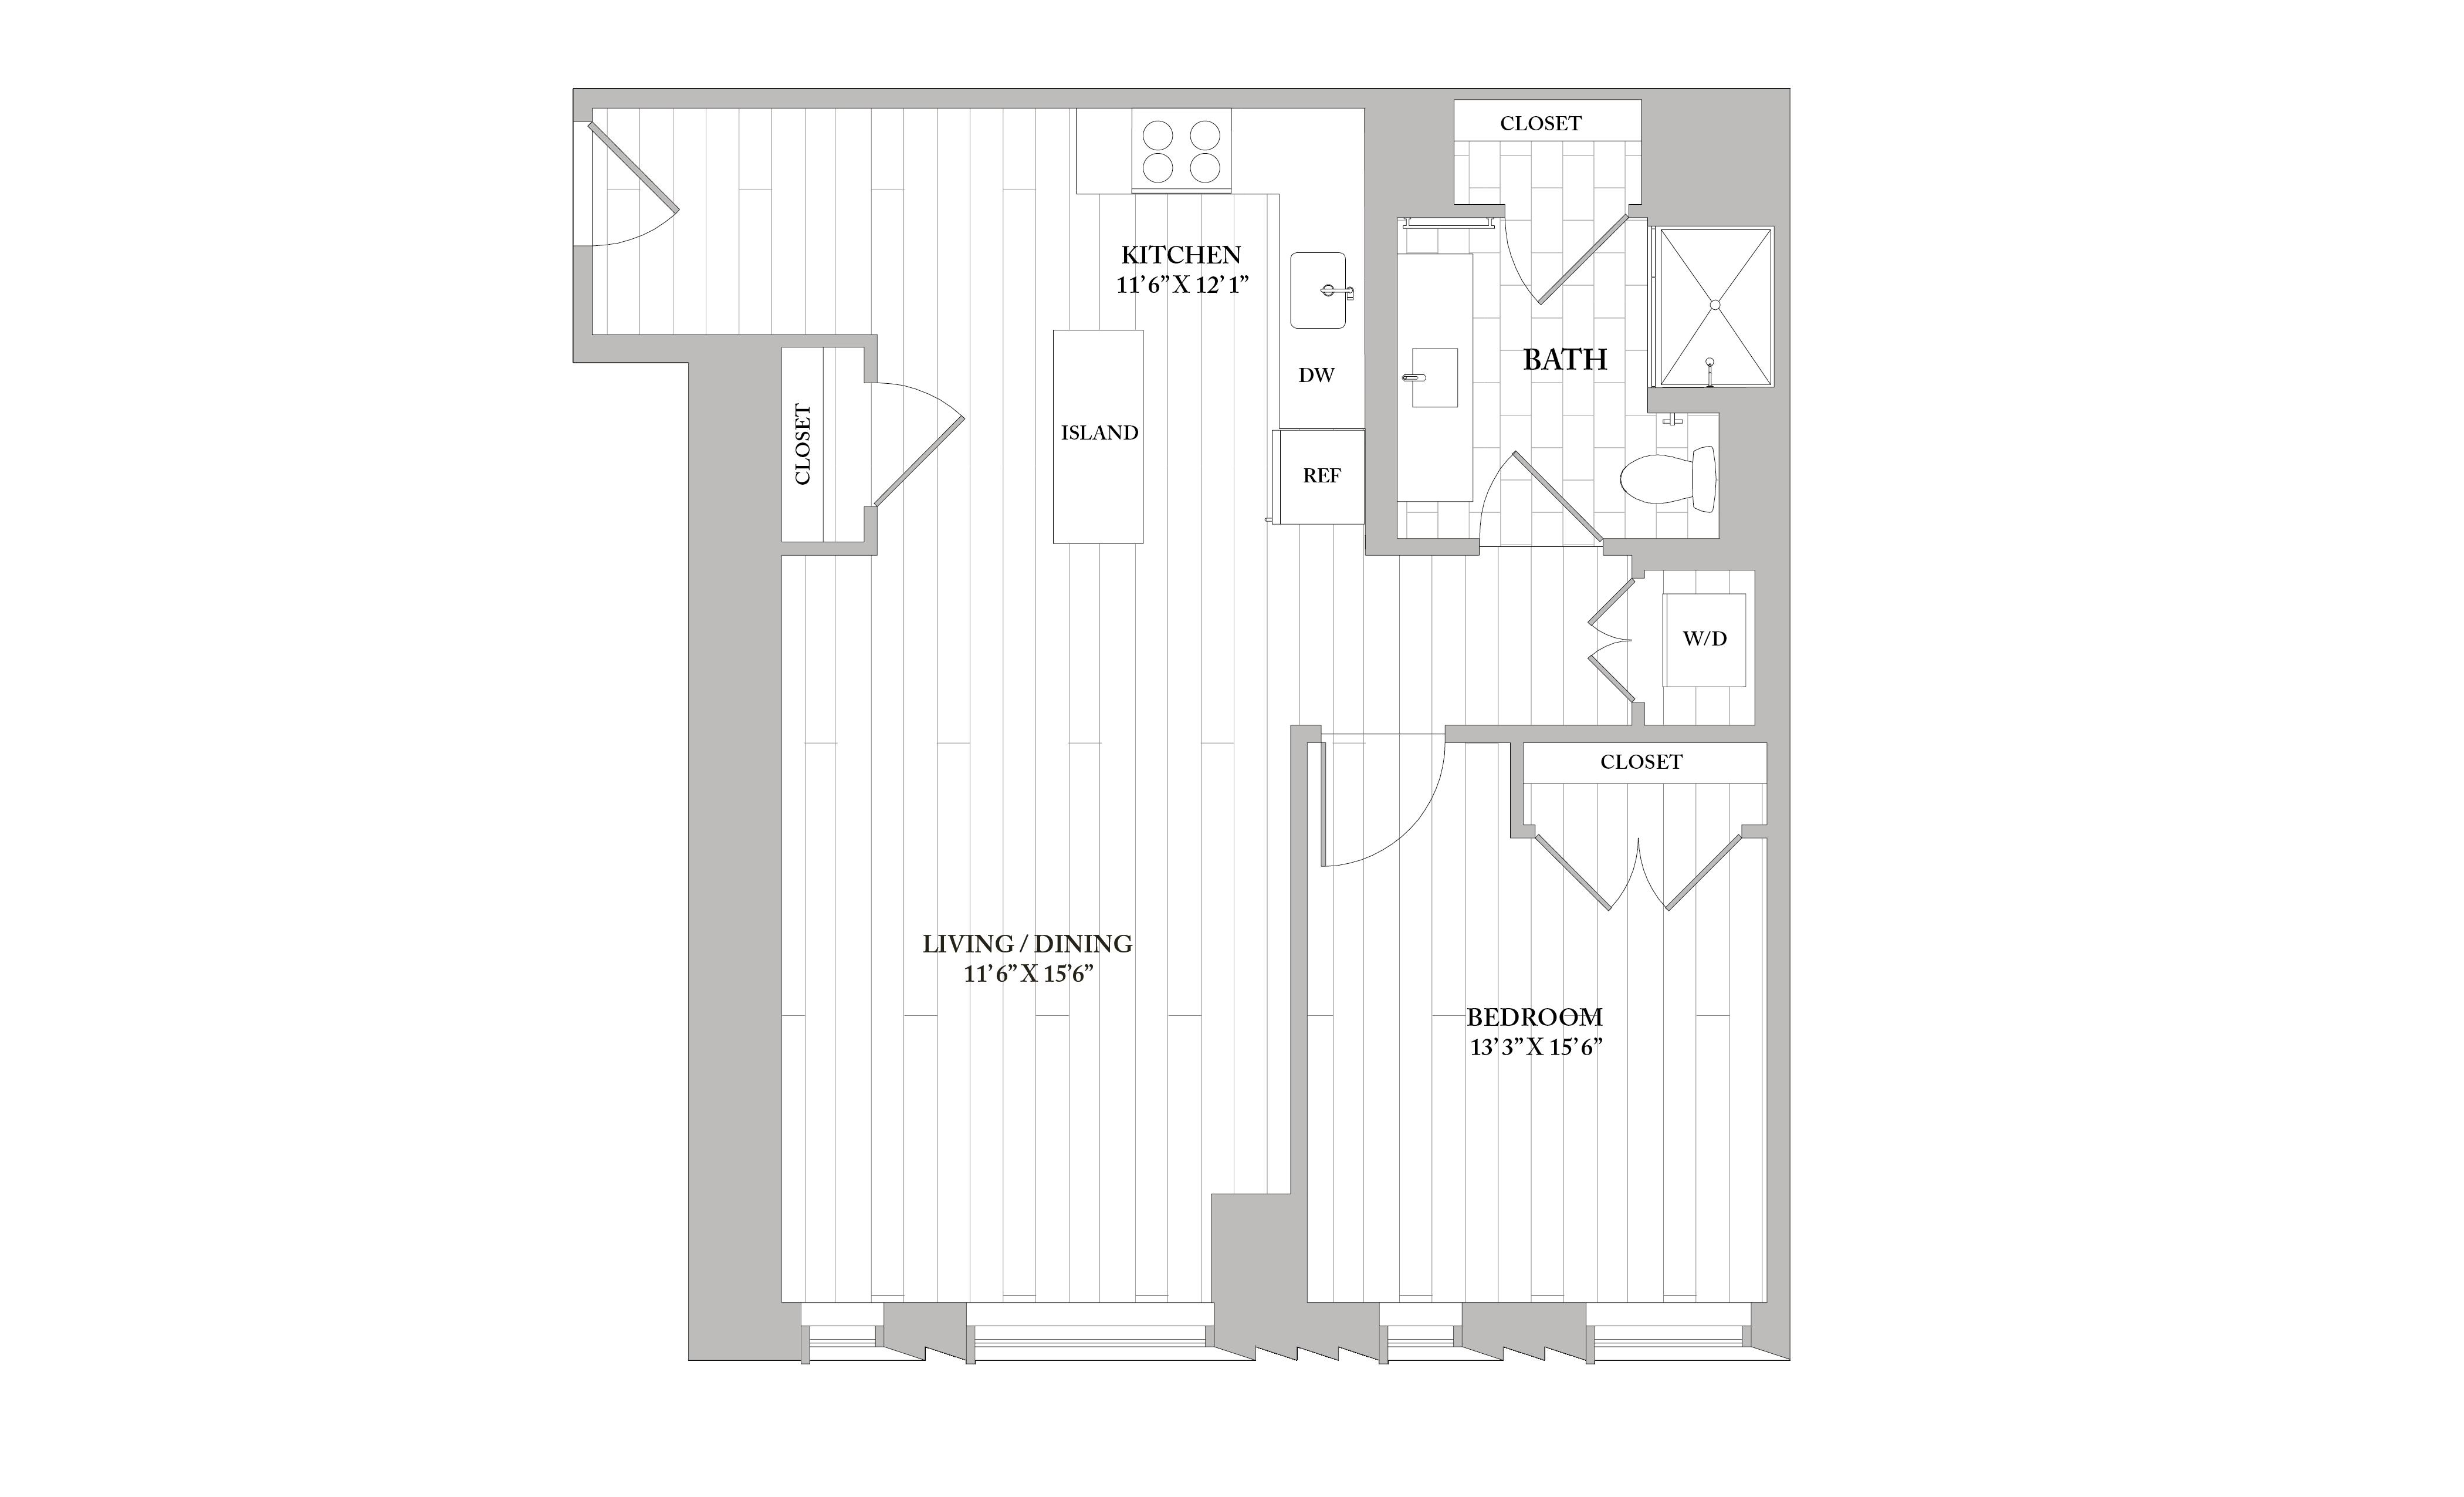 Apartment 1007 floorplan